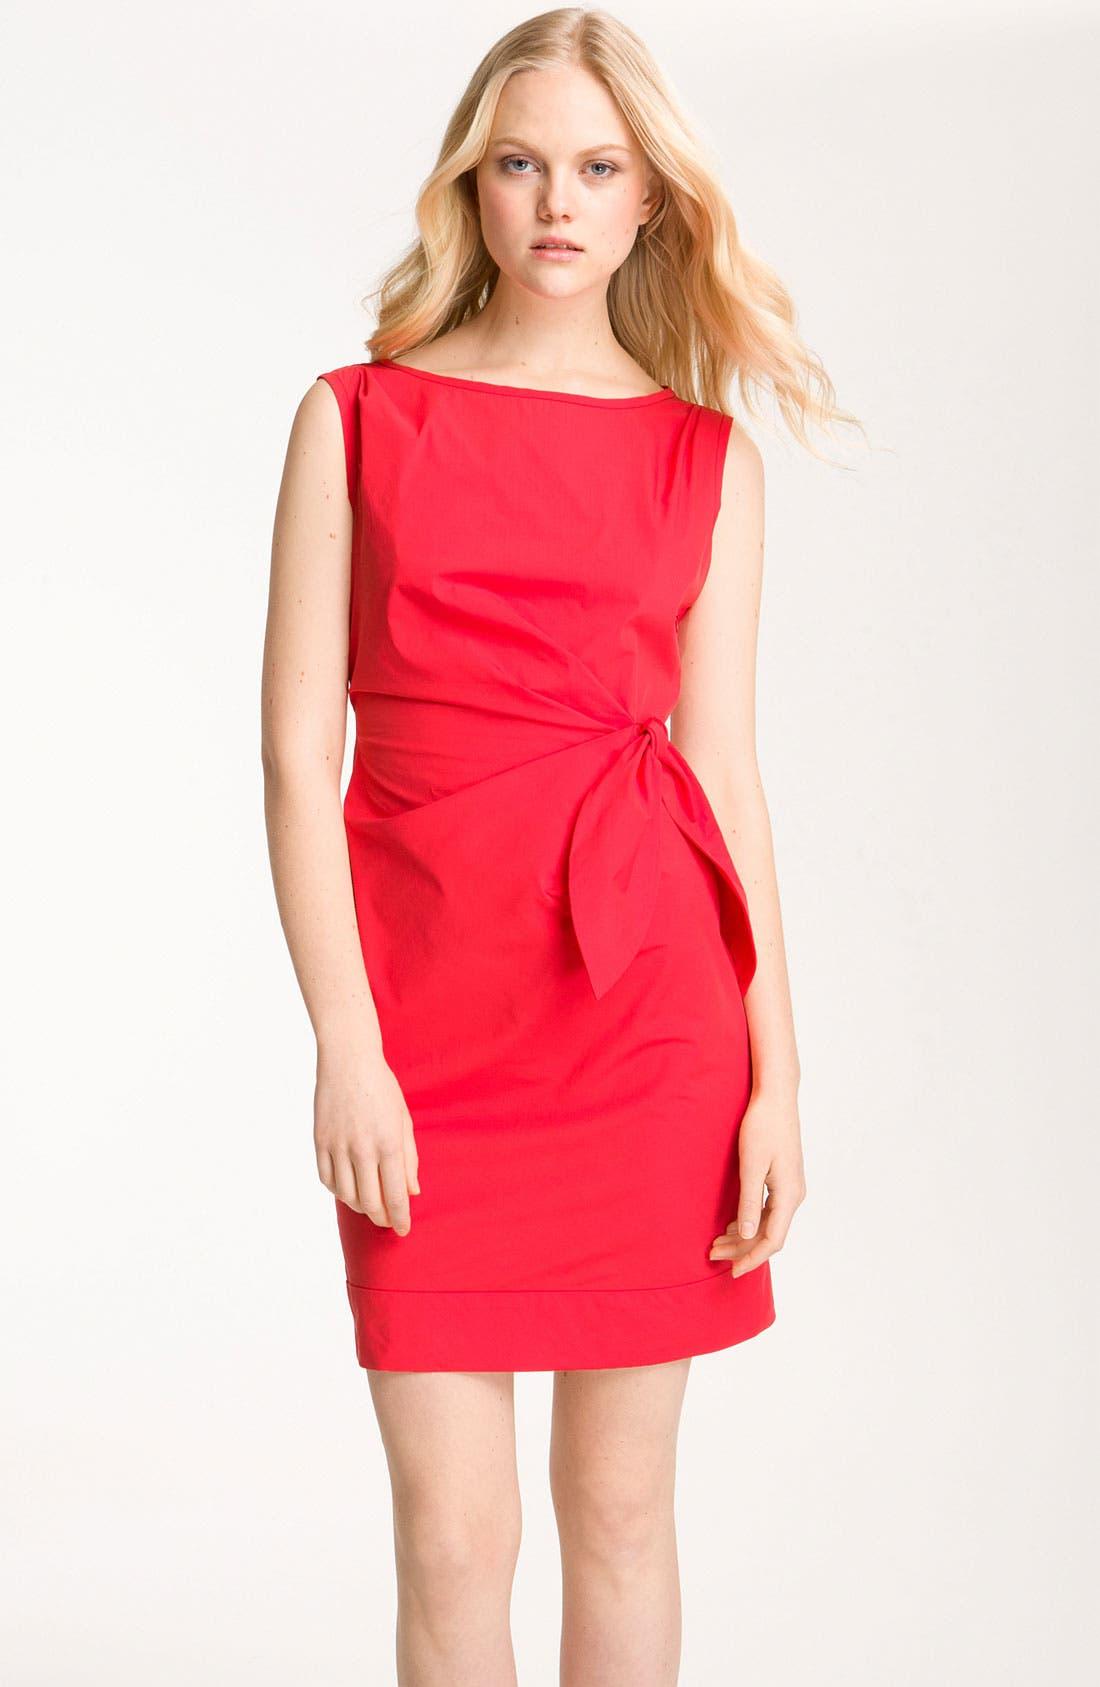 Alternate Image 1 Selected - Diane von Furstenberg 'New Della' Dress